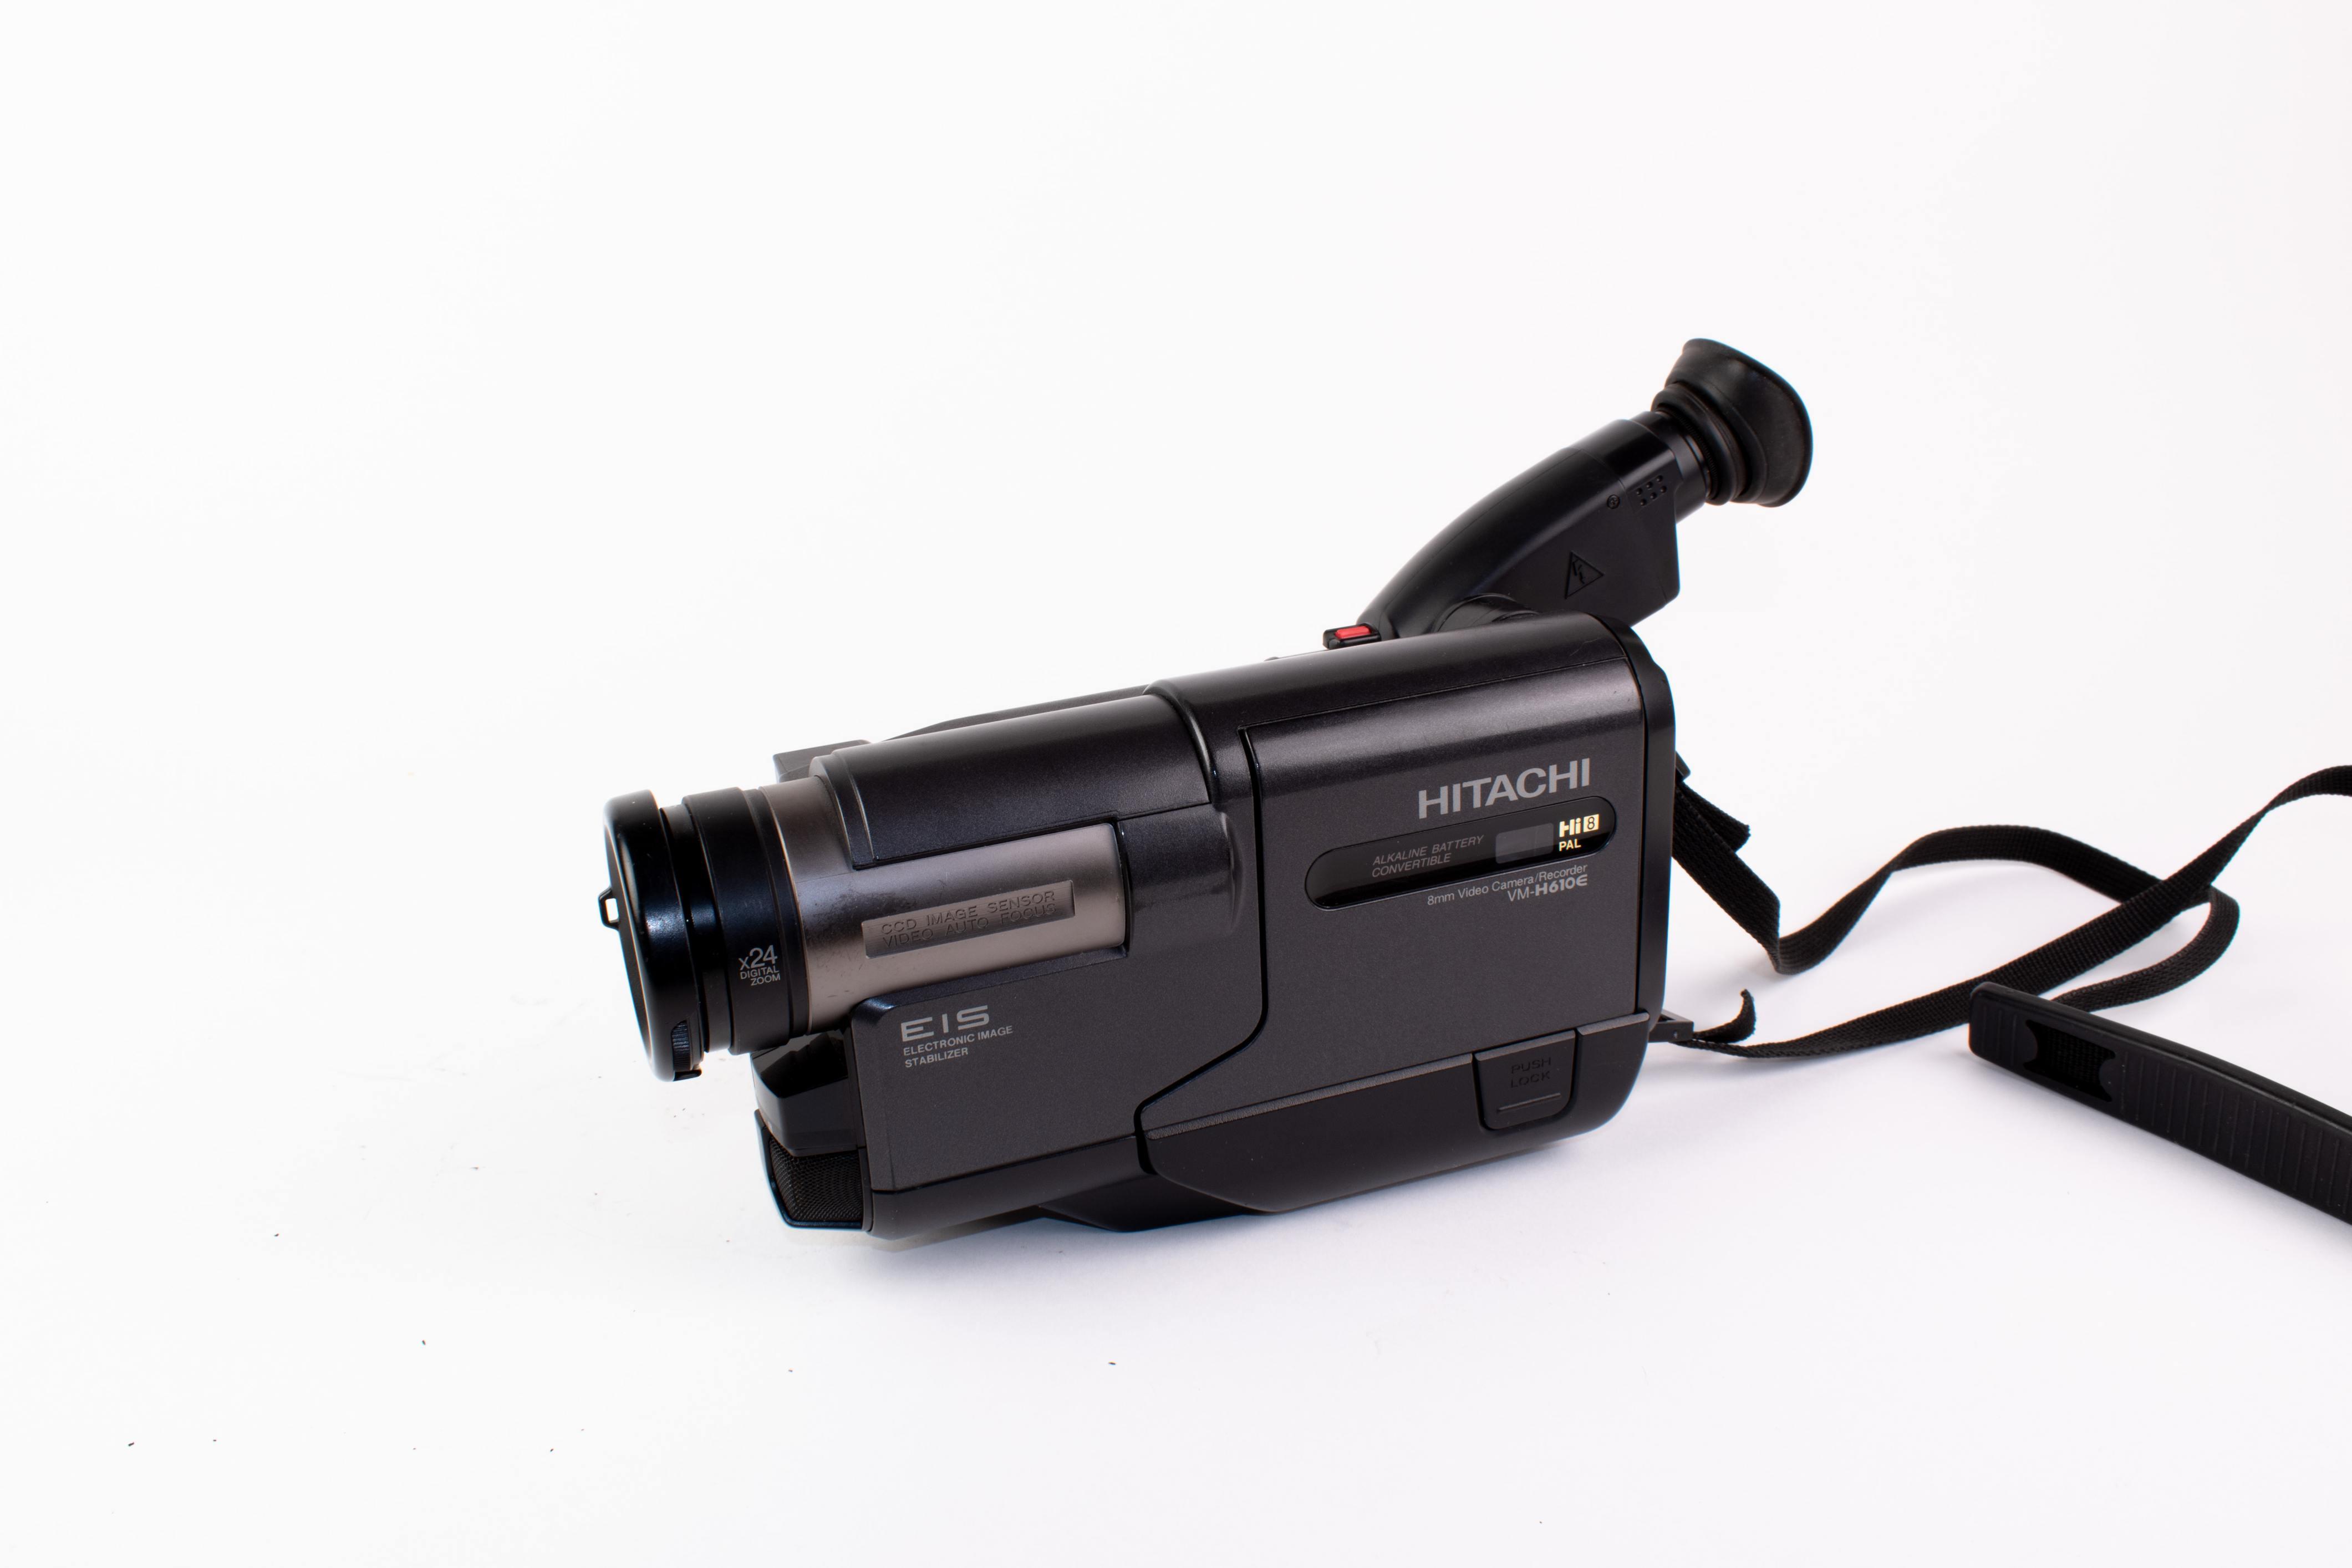 Hitachi Sony CCD-TR412E (hi8 video8) (used)